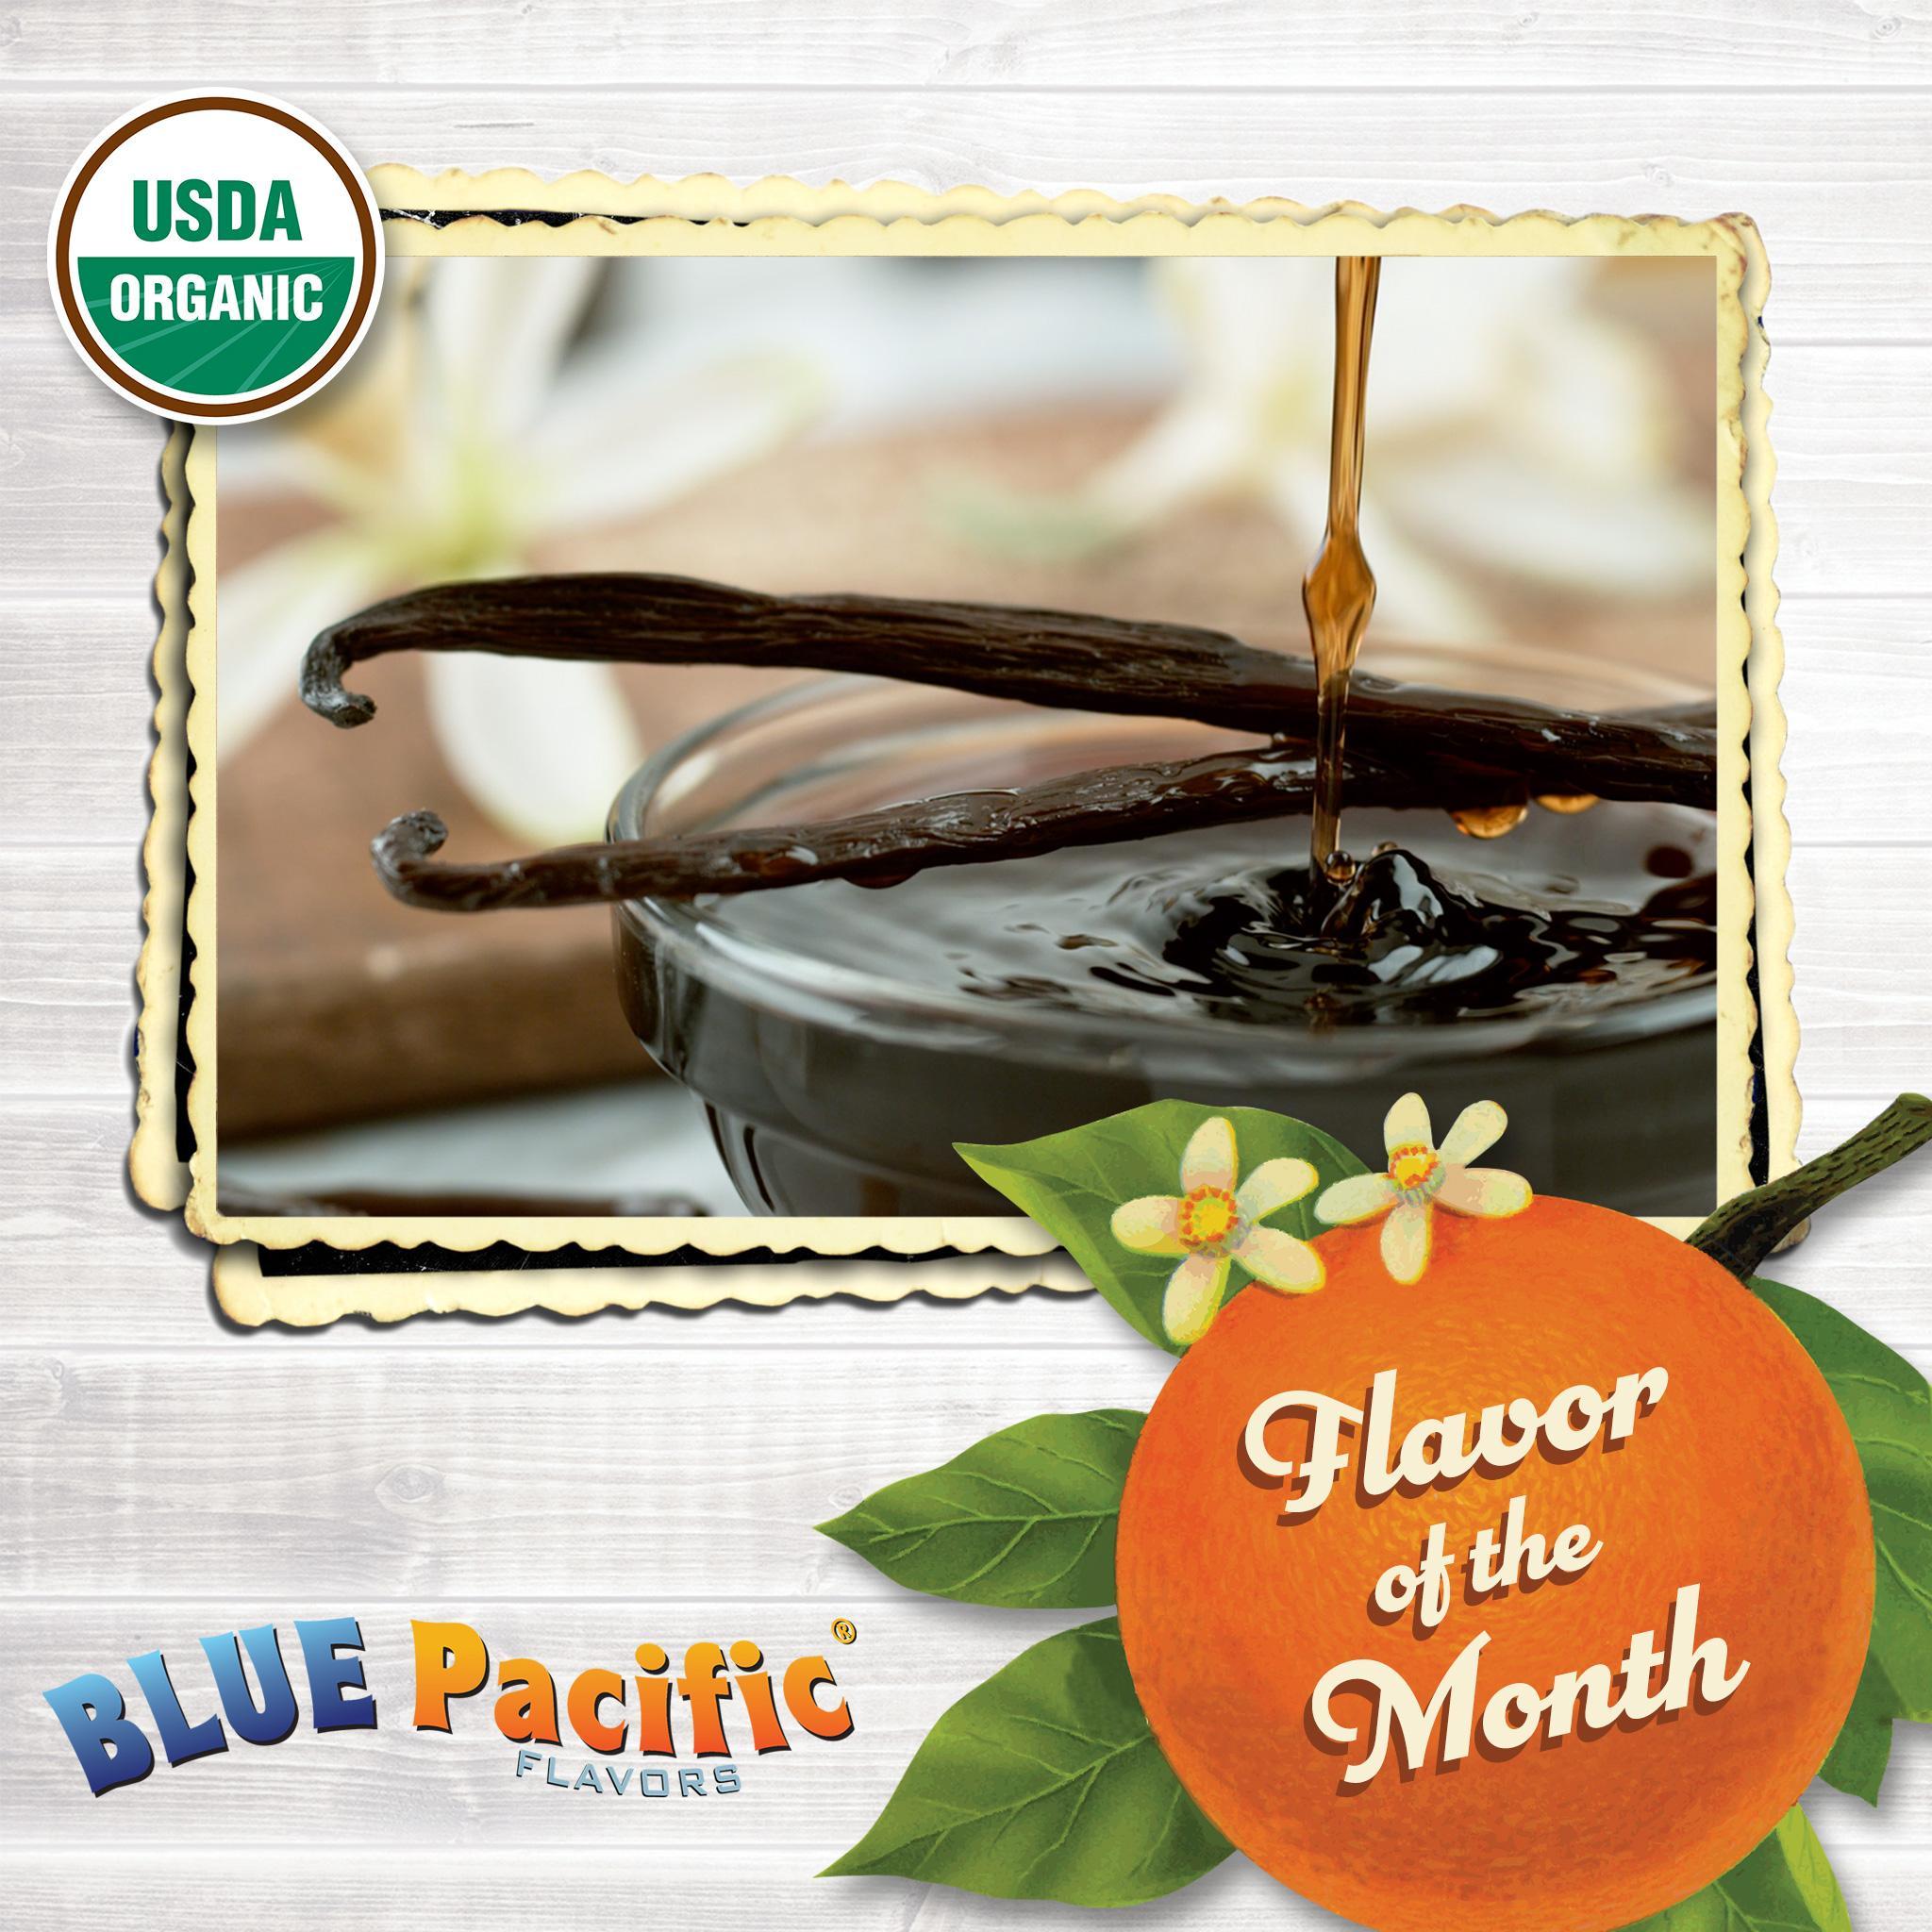 Vanilla Bean, Vanilla Flavor Profile, Vanilla Flavor Of The Month